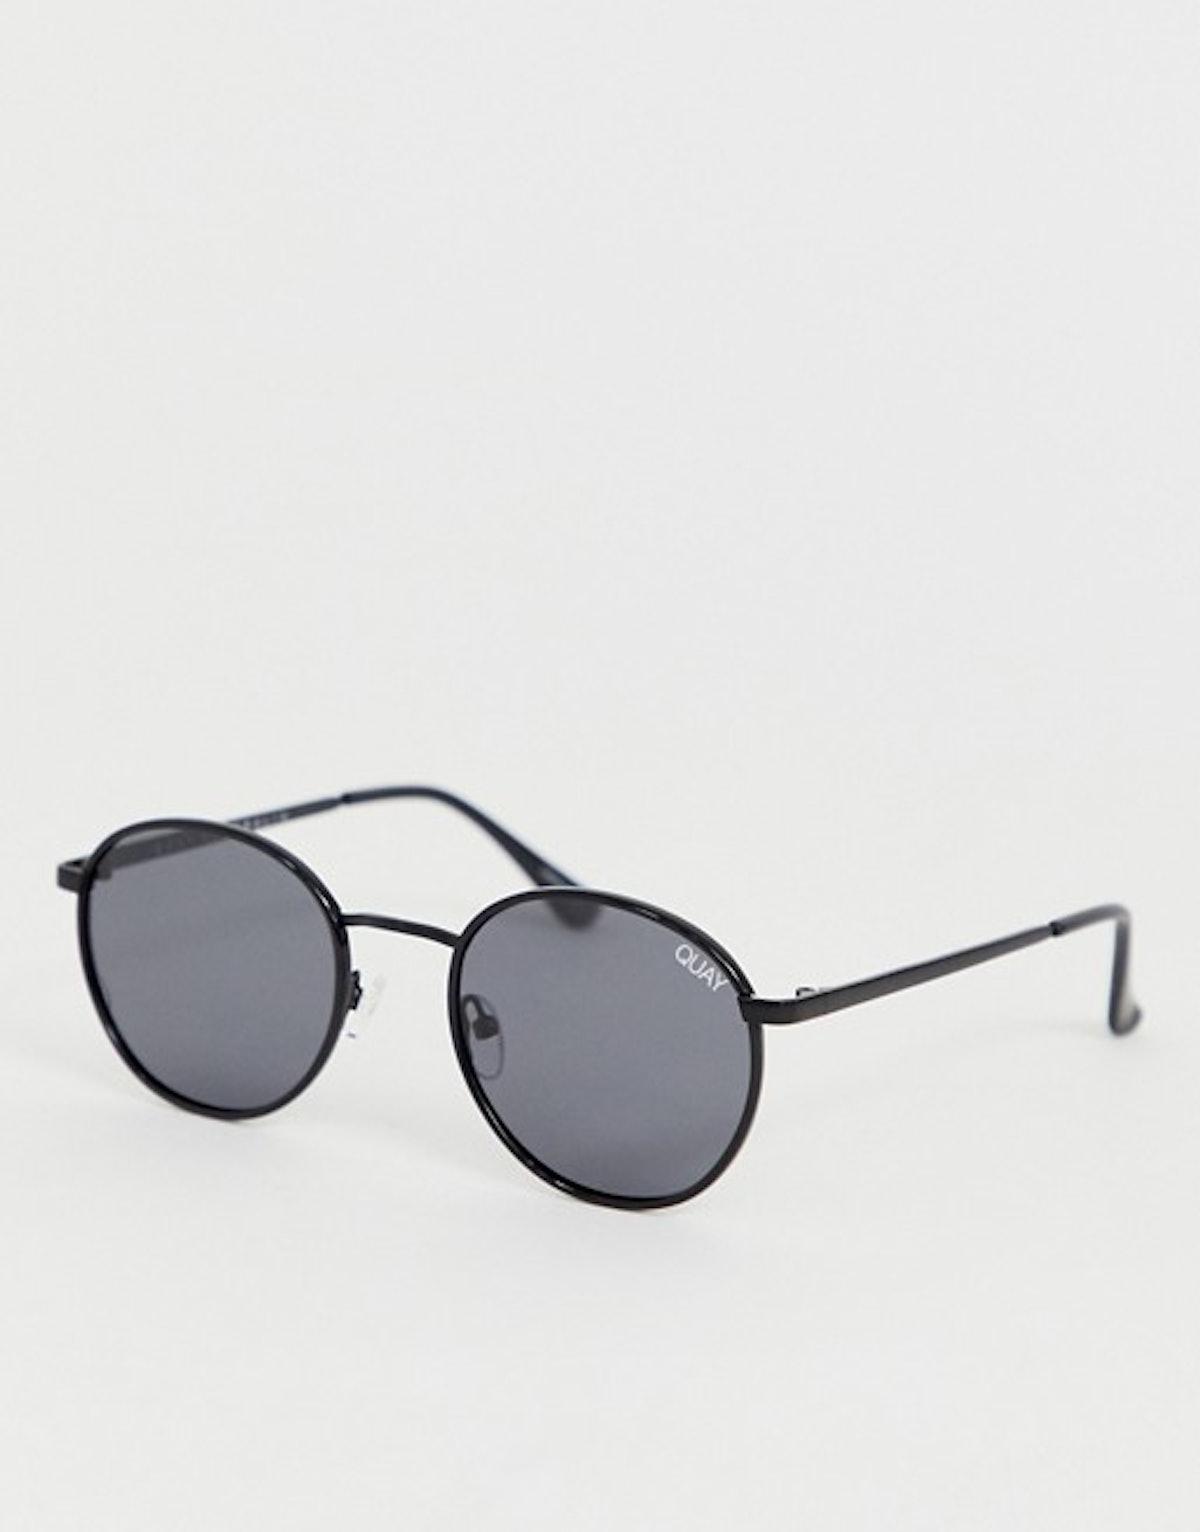 Quay Australia Omen Round Sunglasses in Black